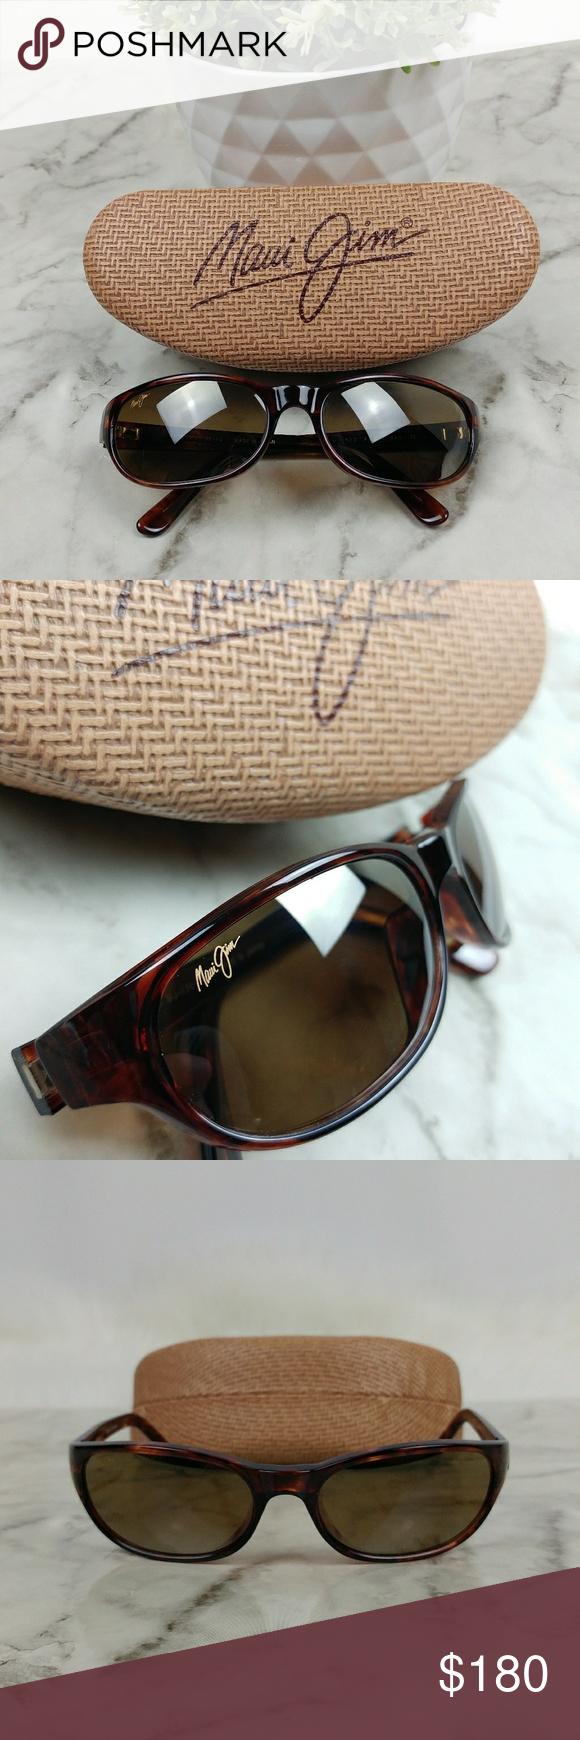 a905ac69368c Maui Jim Cyclone MJ-136-10 Sunglasses Rare, Discontinued and Sold out Maui